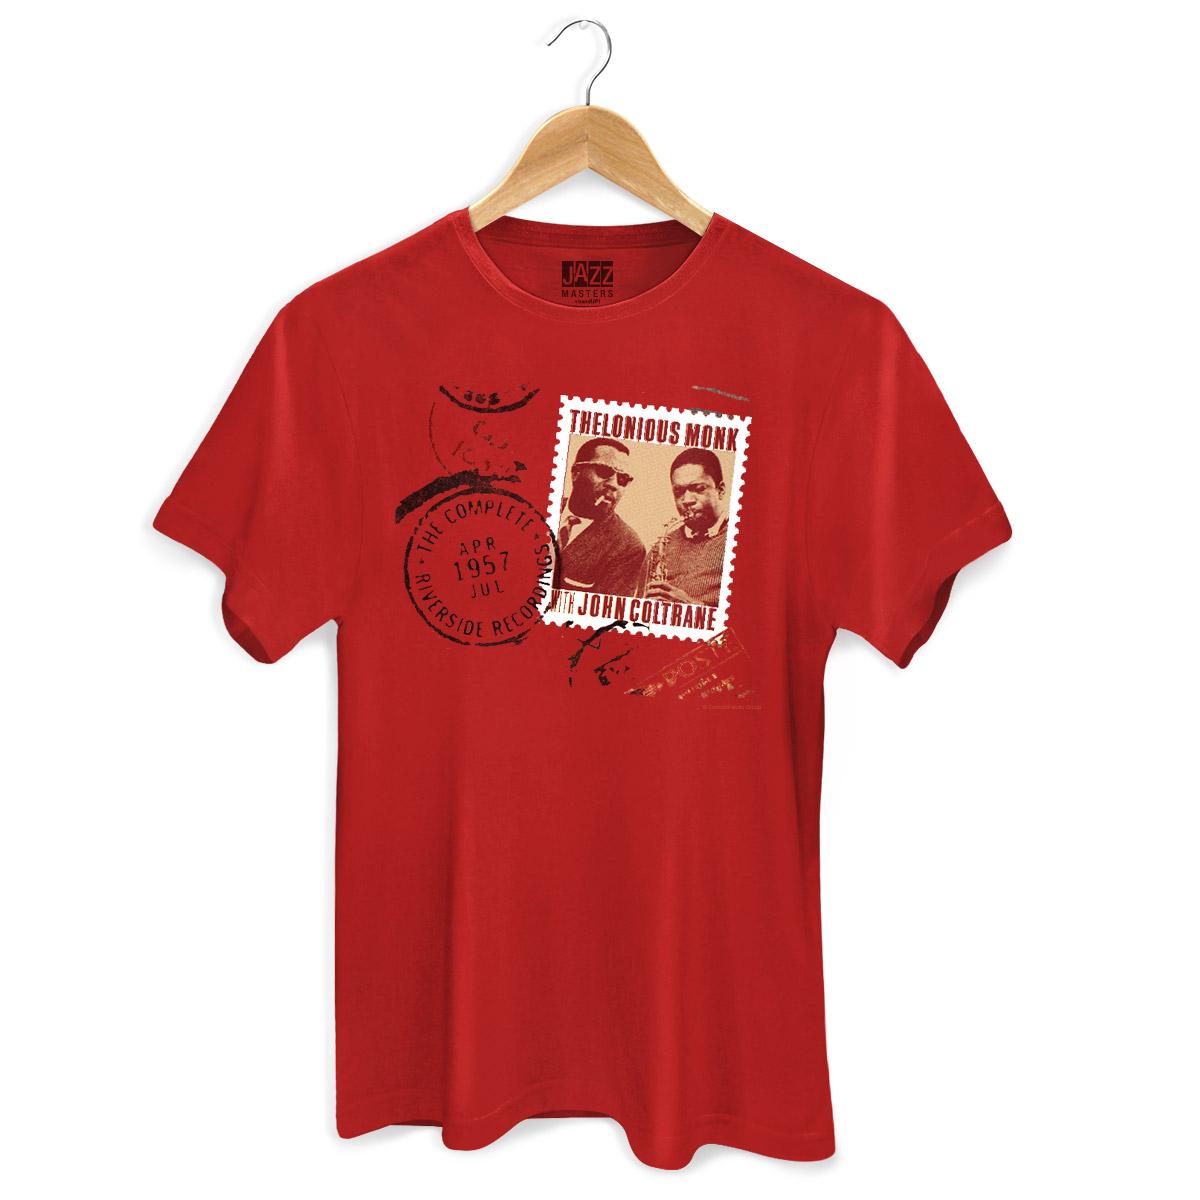 Camiseta Masculina Thelonious Monk With John Coltrane